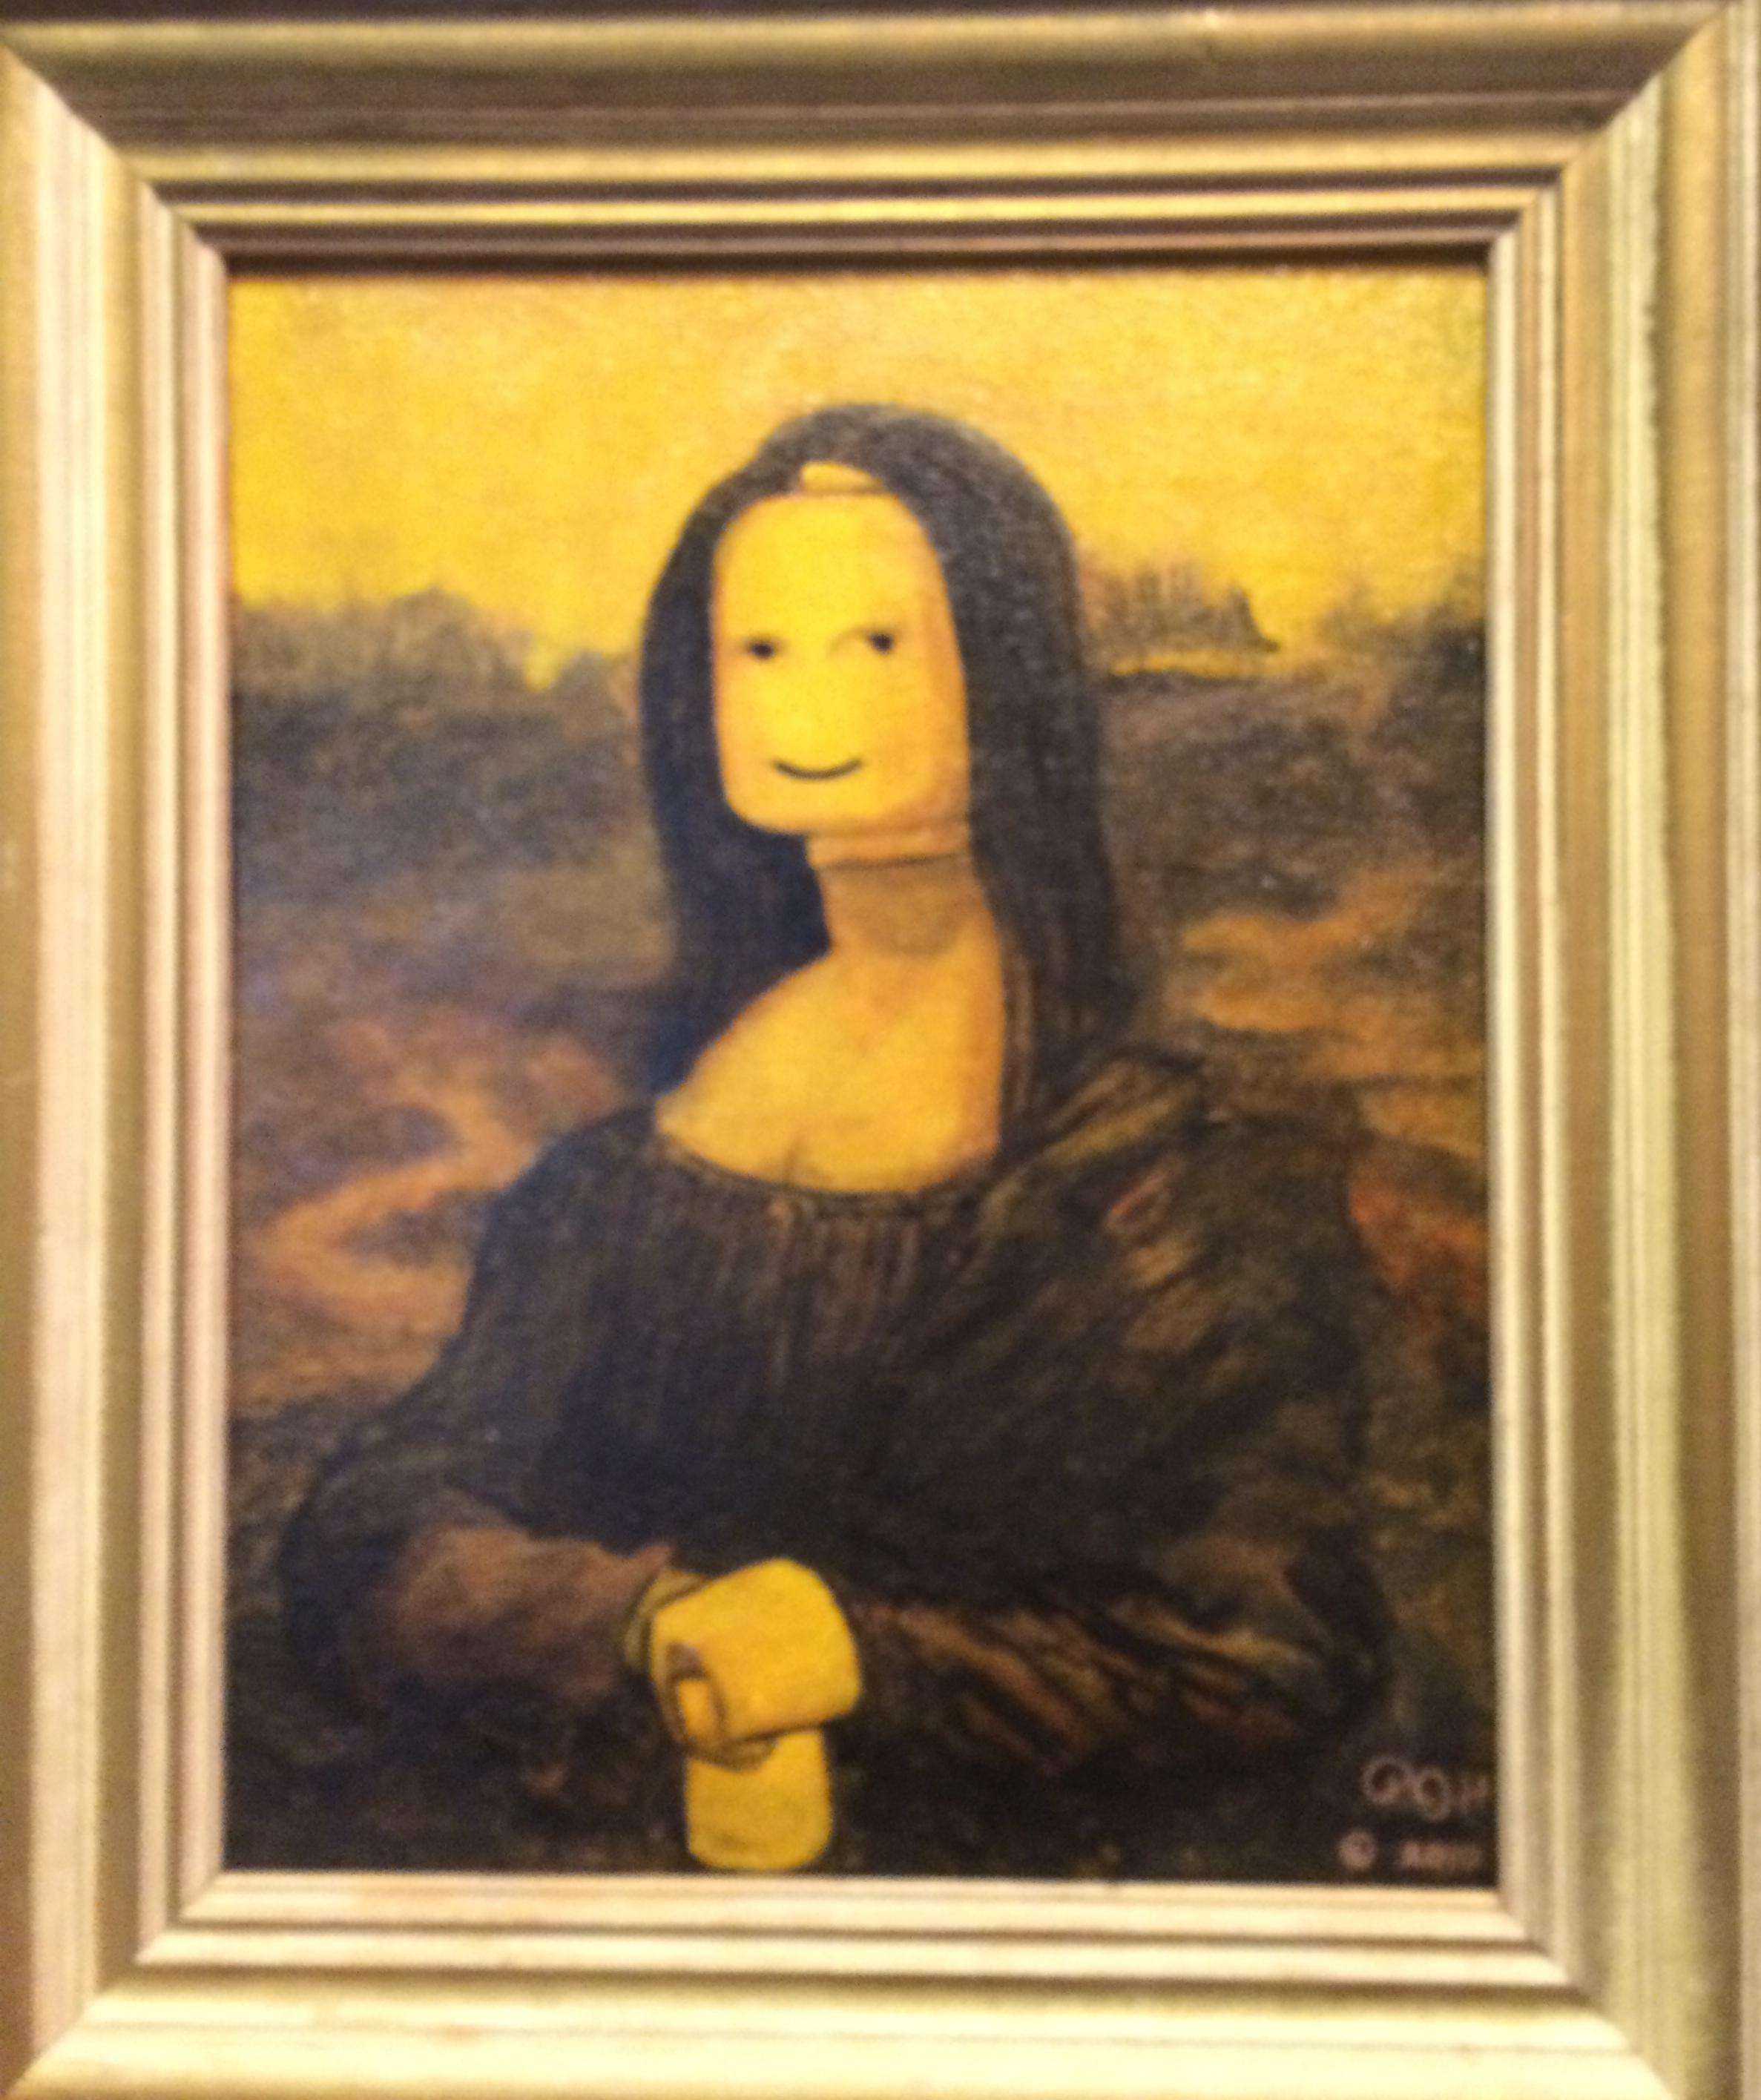 SMILE...Hecker's Mona Lego harks back to Da Vinci